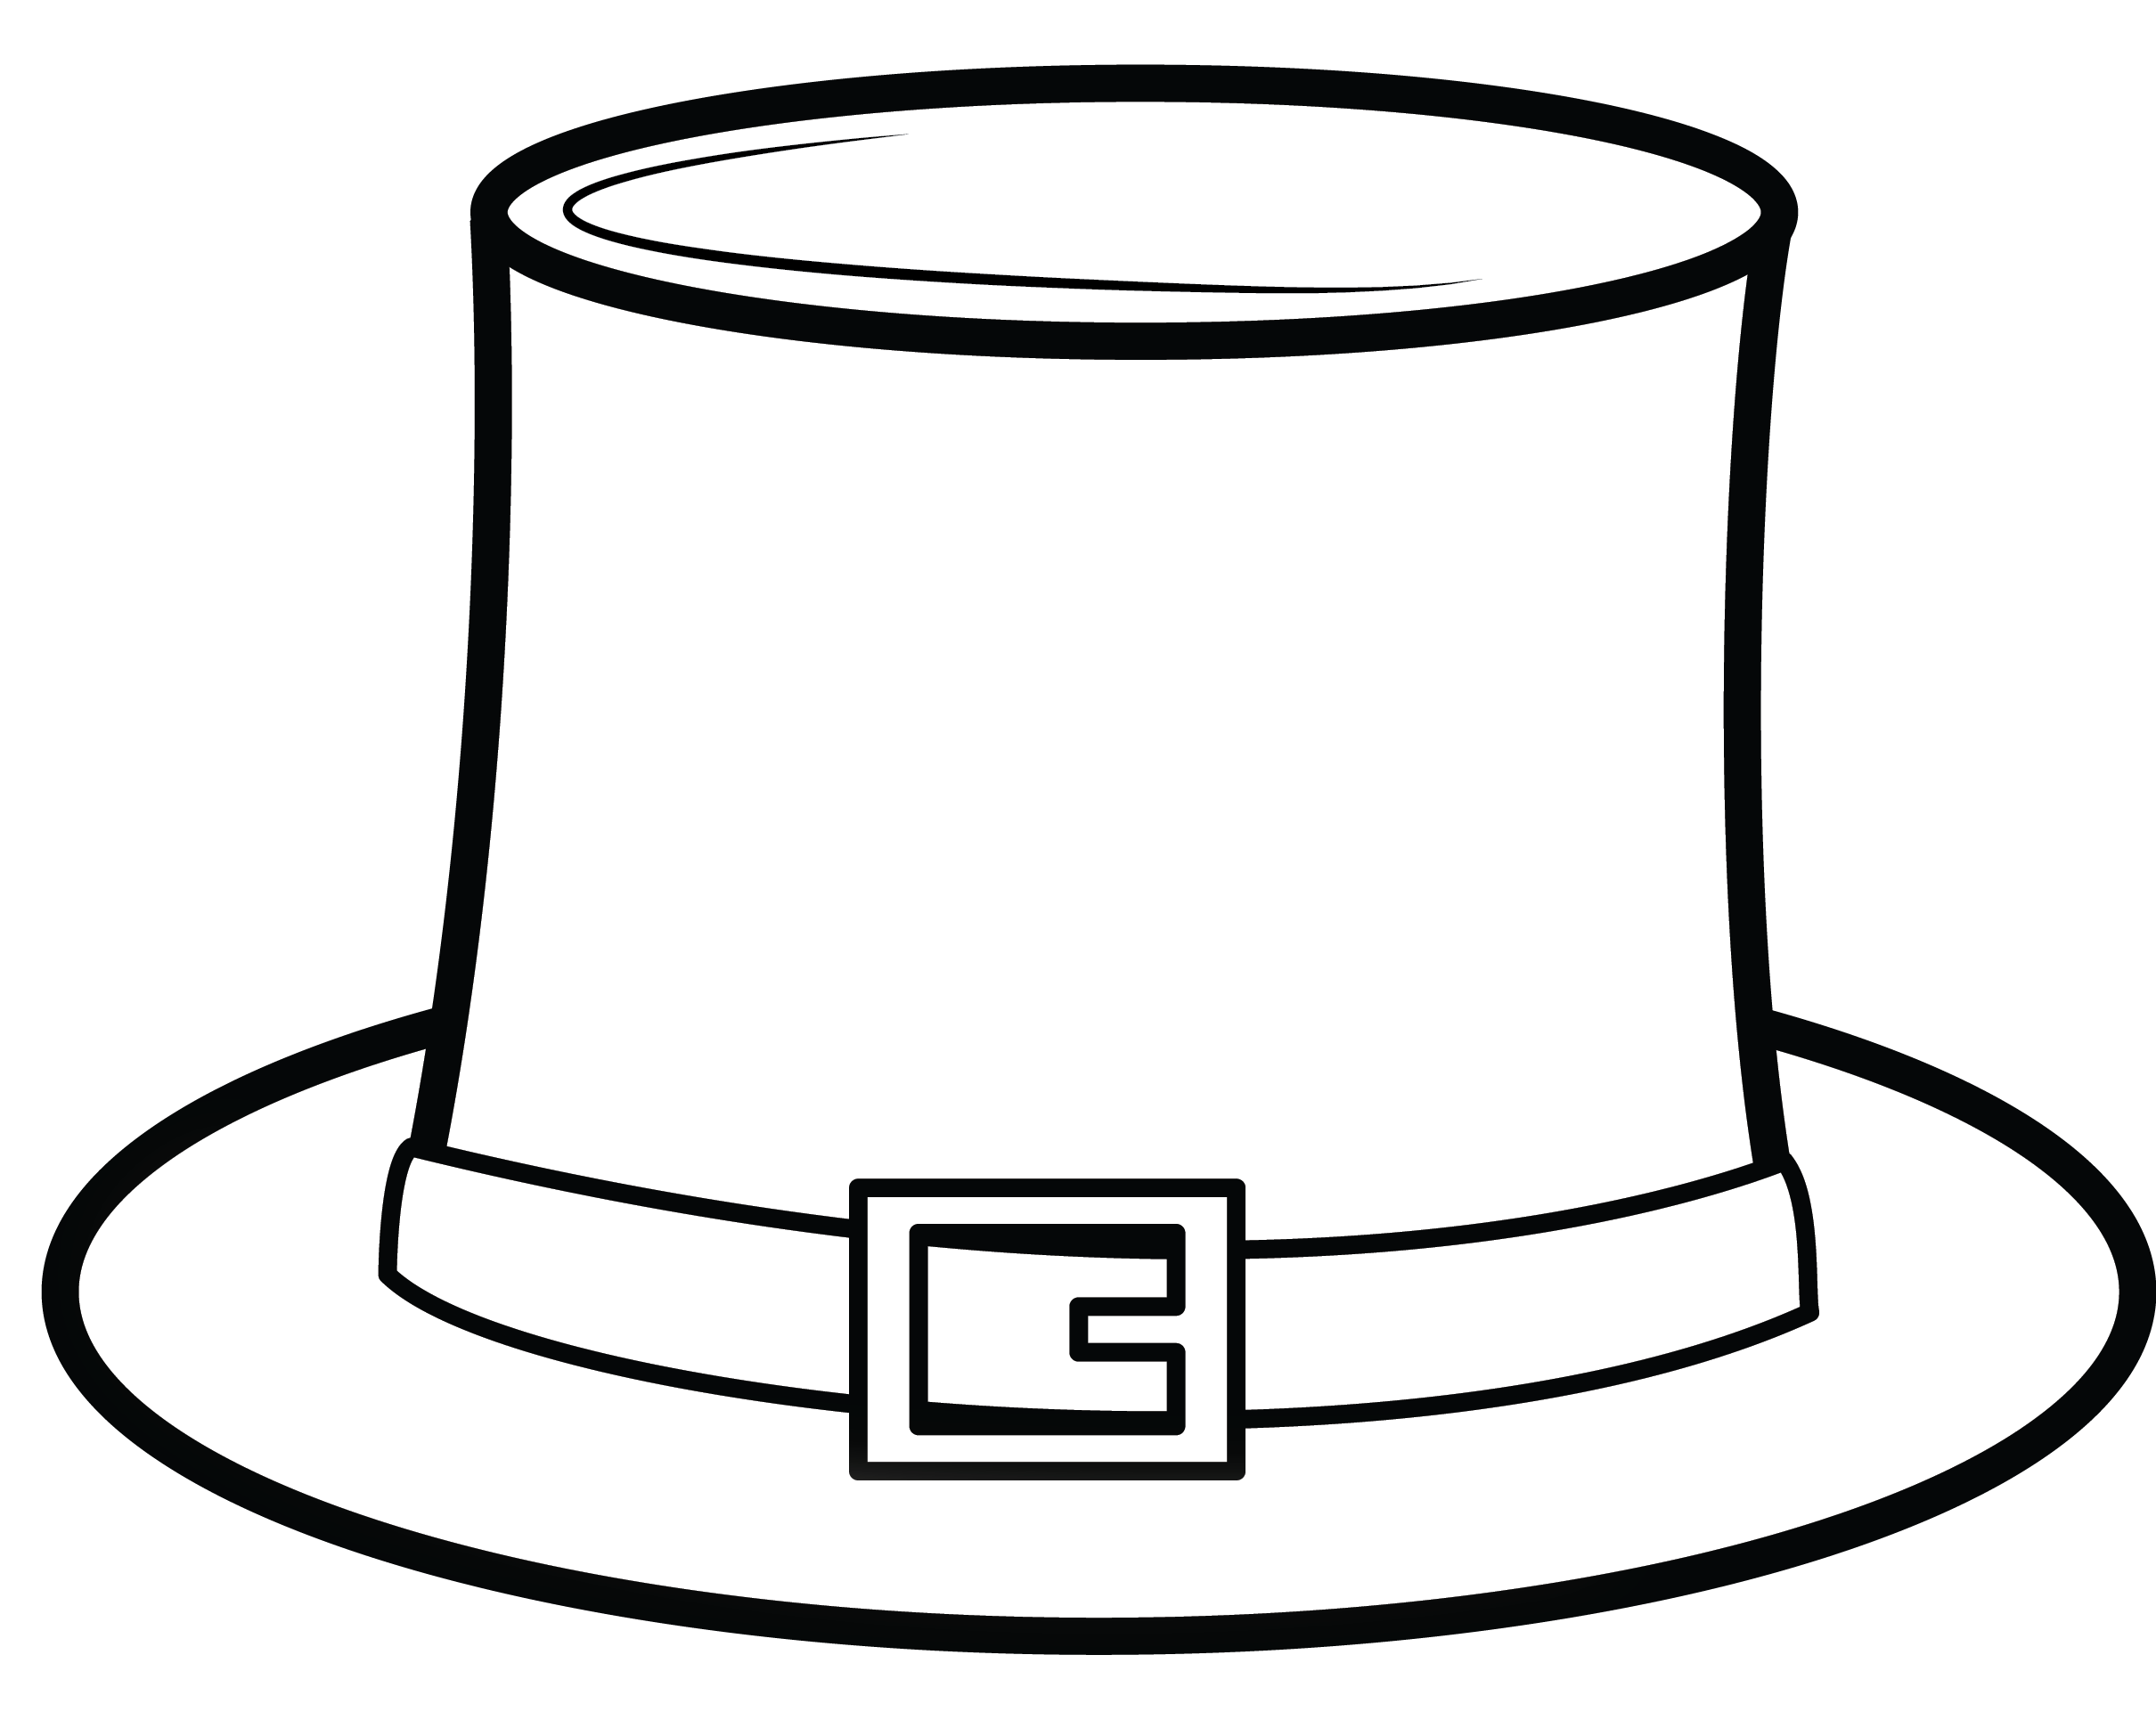 clipart black and white stock St patrick clip art. Grades clipart high grade